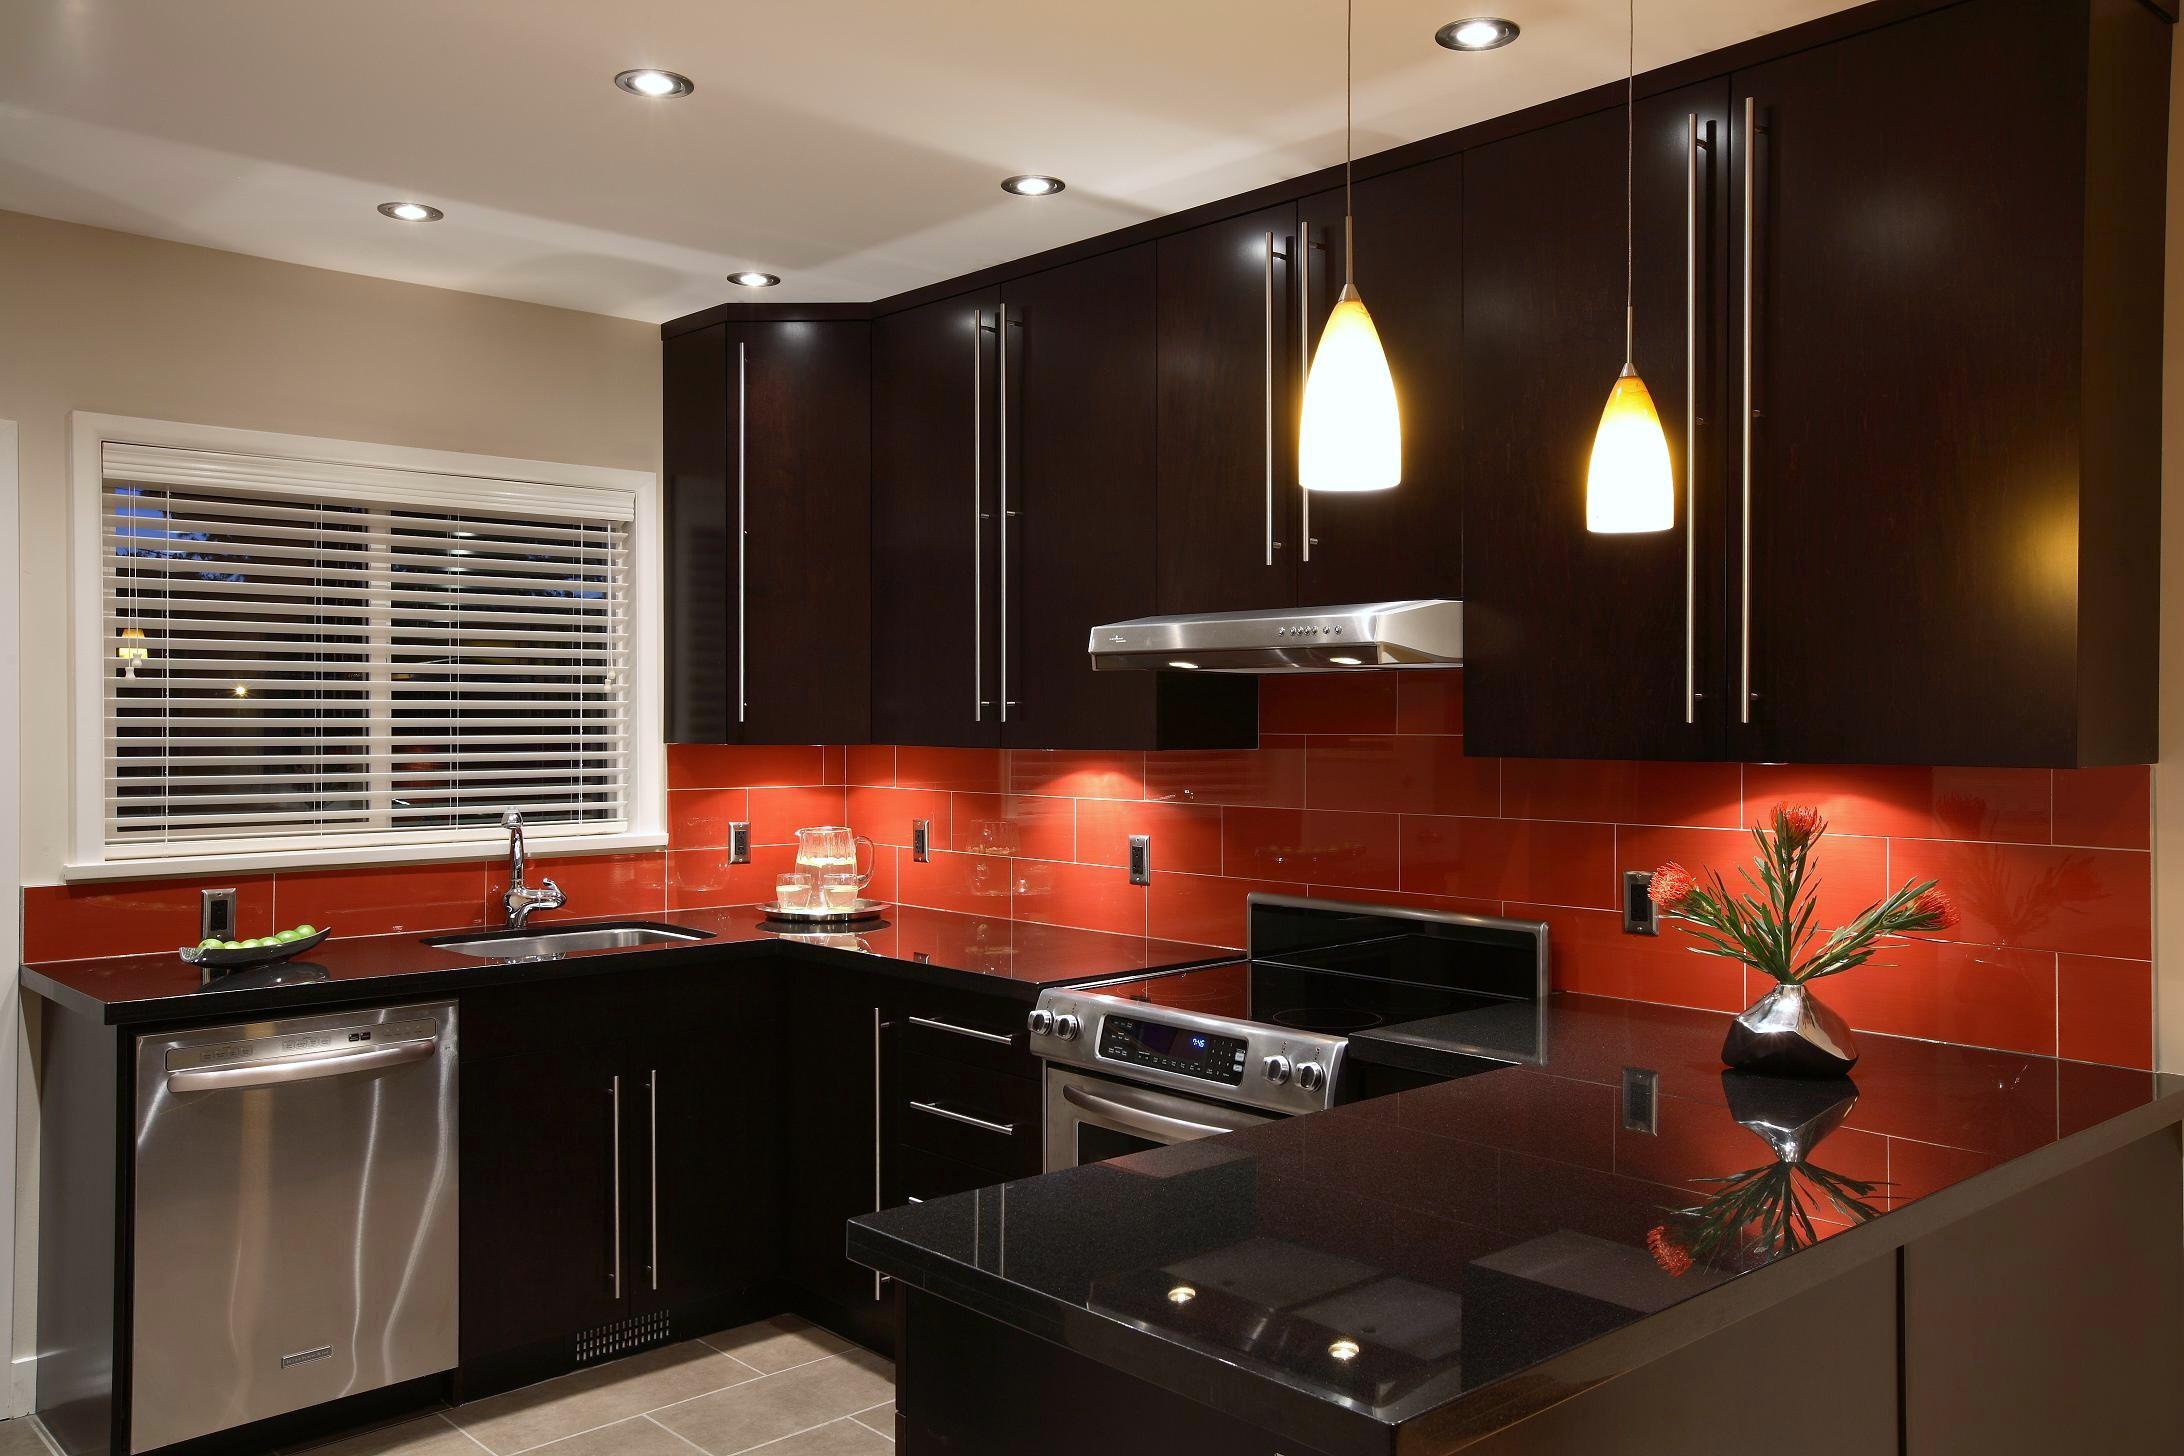 двухкомнатная квартира кухня